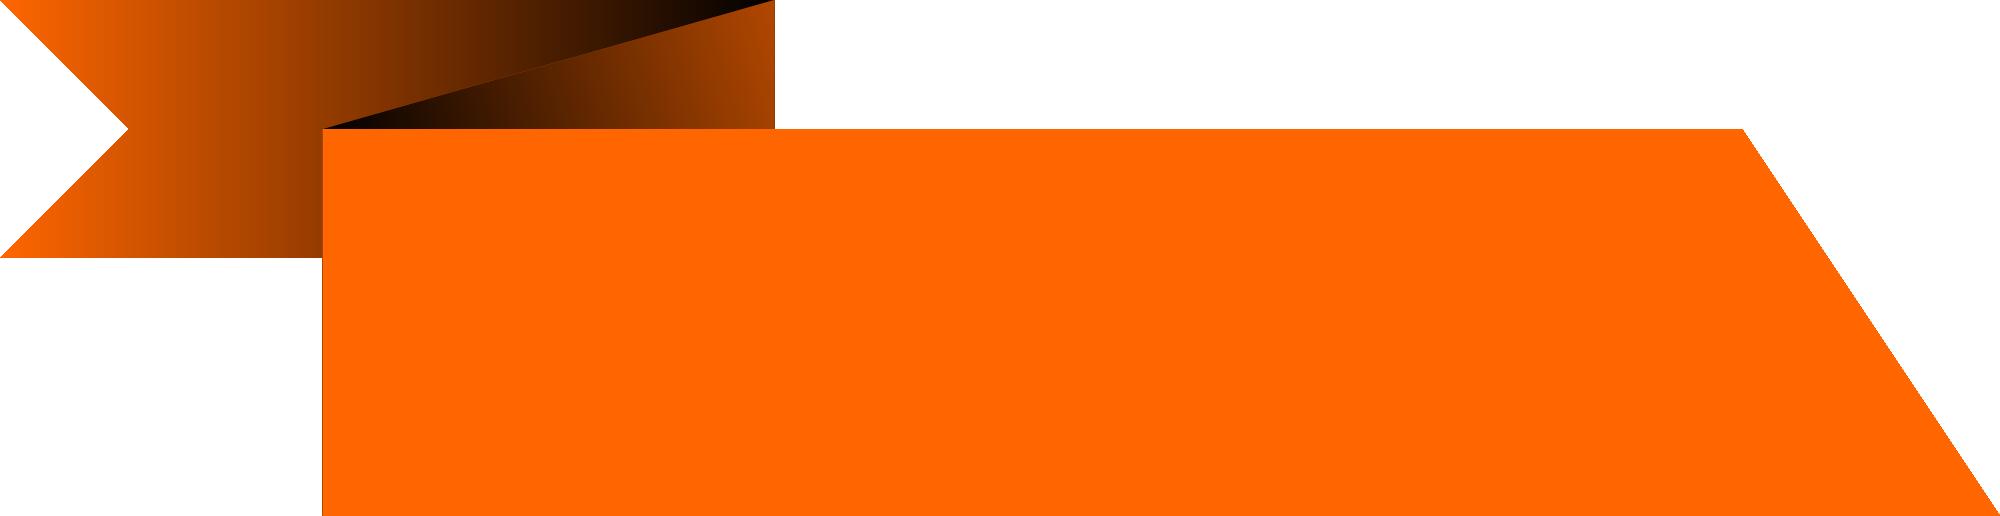 6 origami banner rectangle vector  png transparent  svg